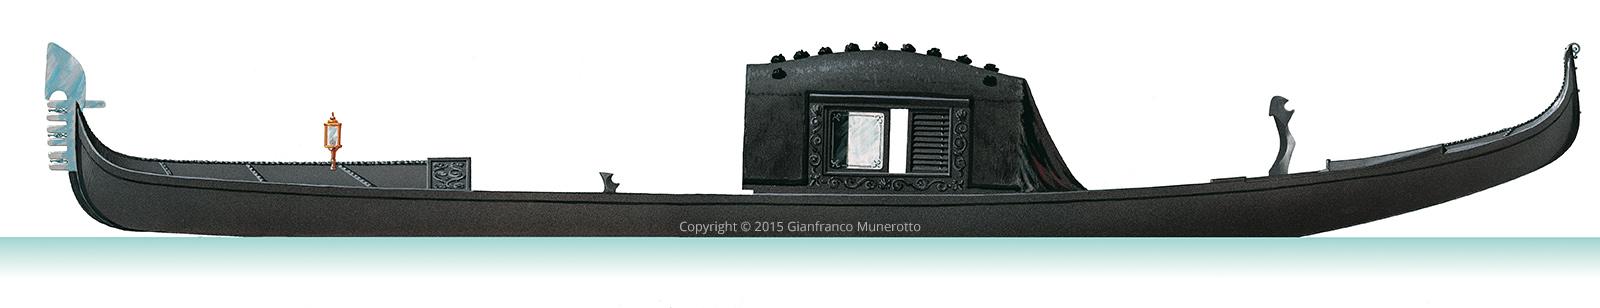 gondola-800-gianfranco-munarotto